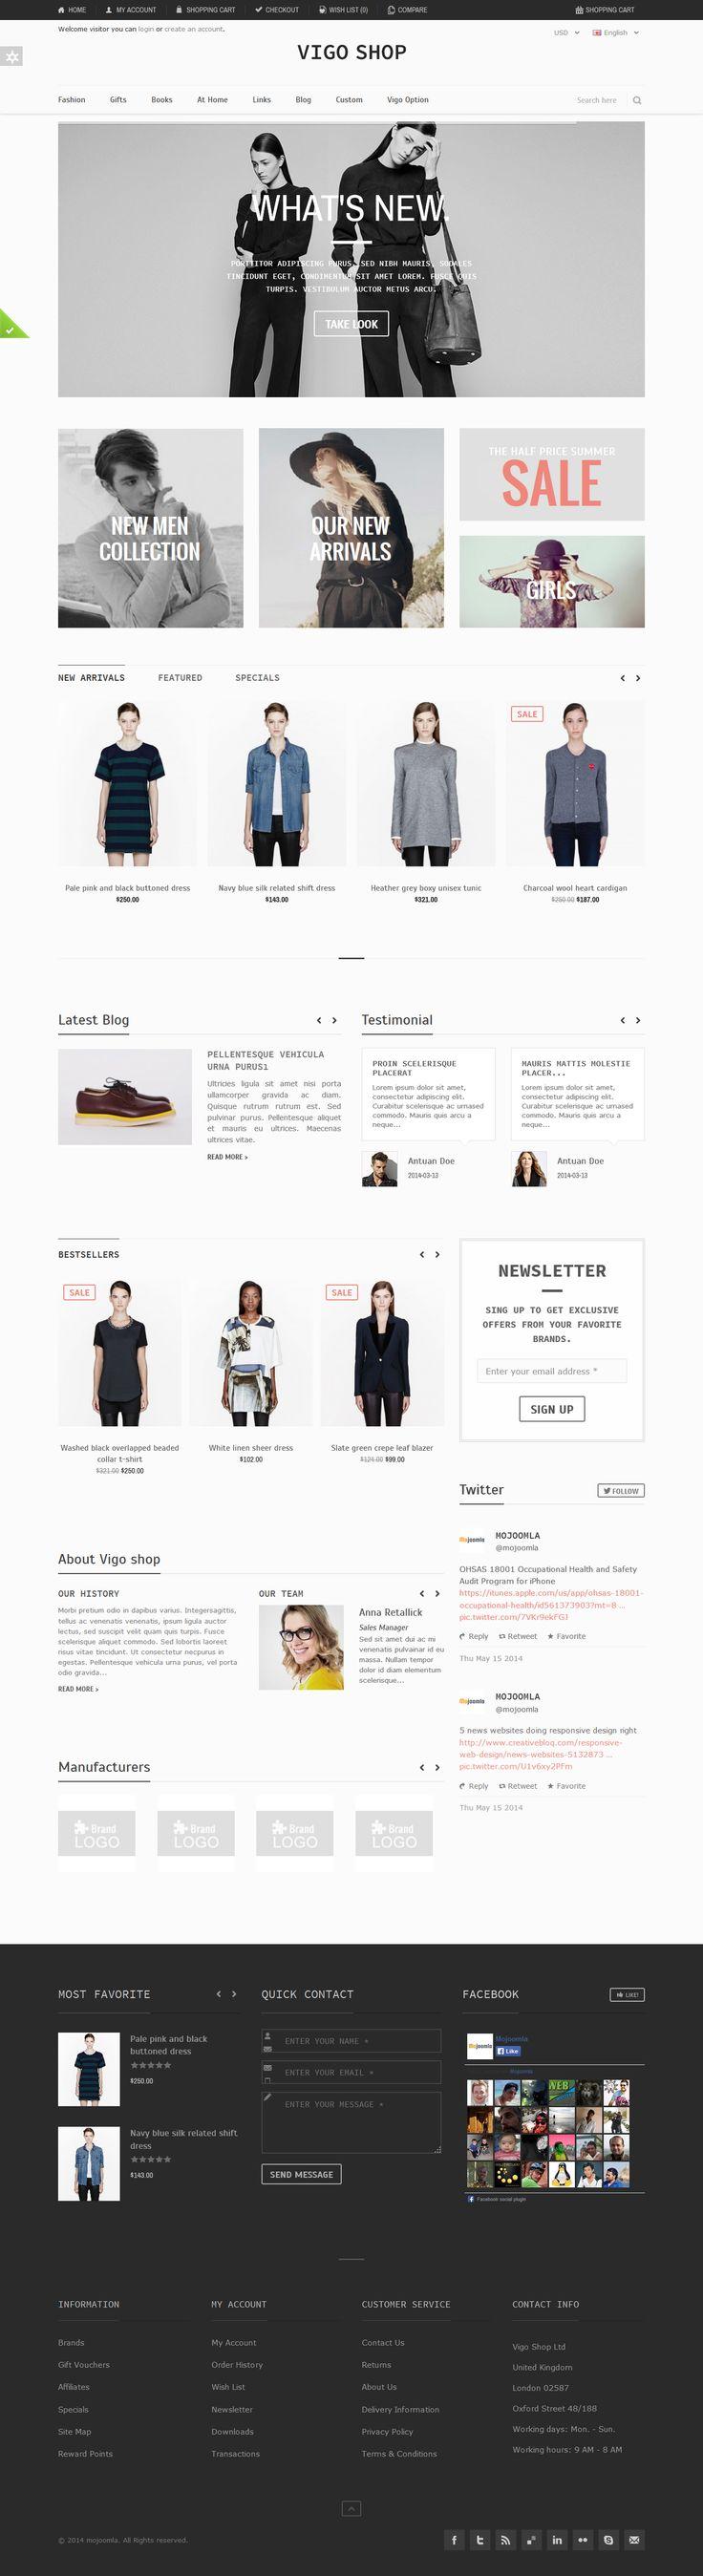 Responsive Joomla template  http://themeforest.net/item/vigo-shop-responsive-multipurpose-joomla-theme/8328826